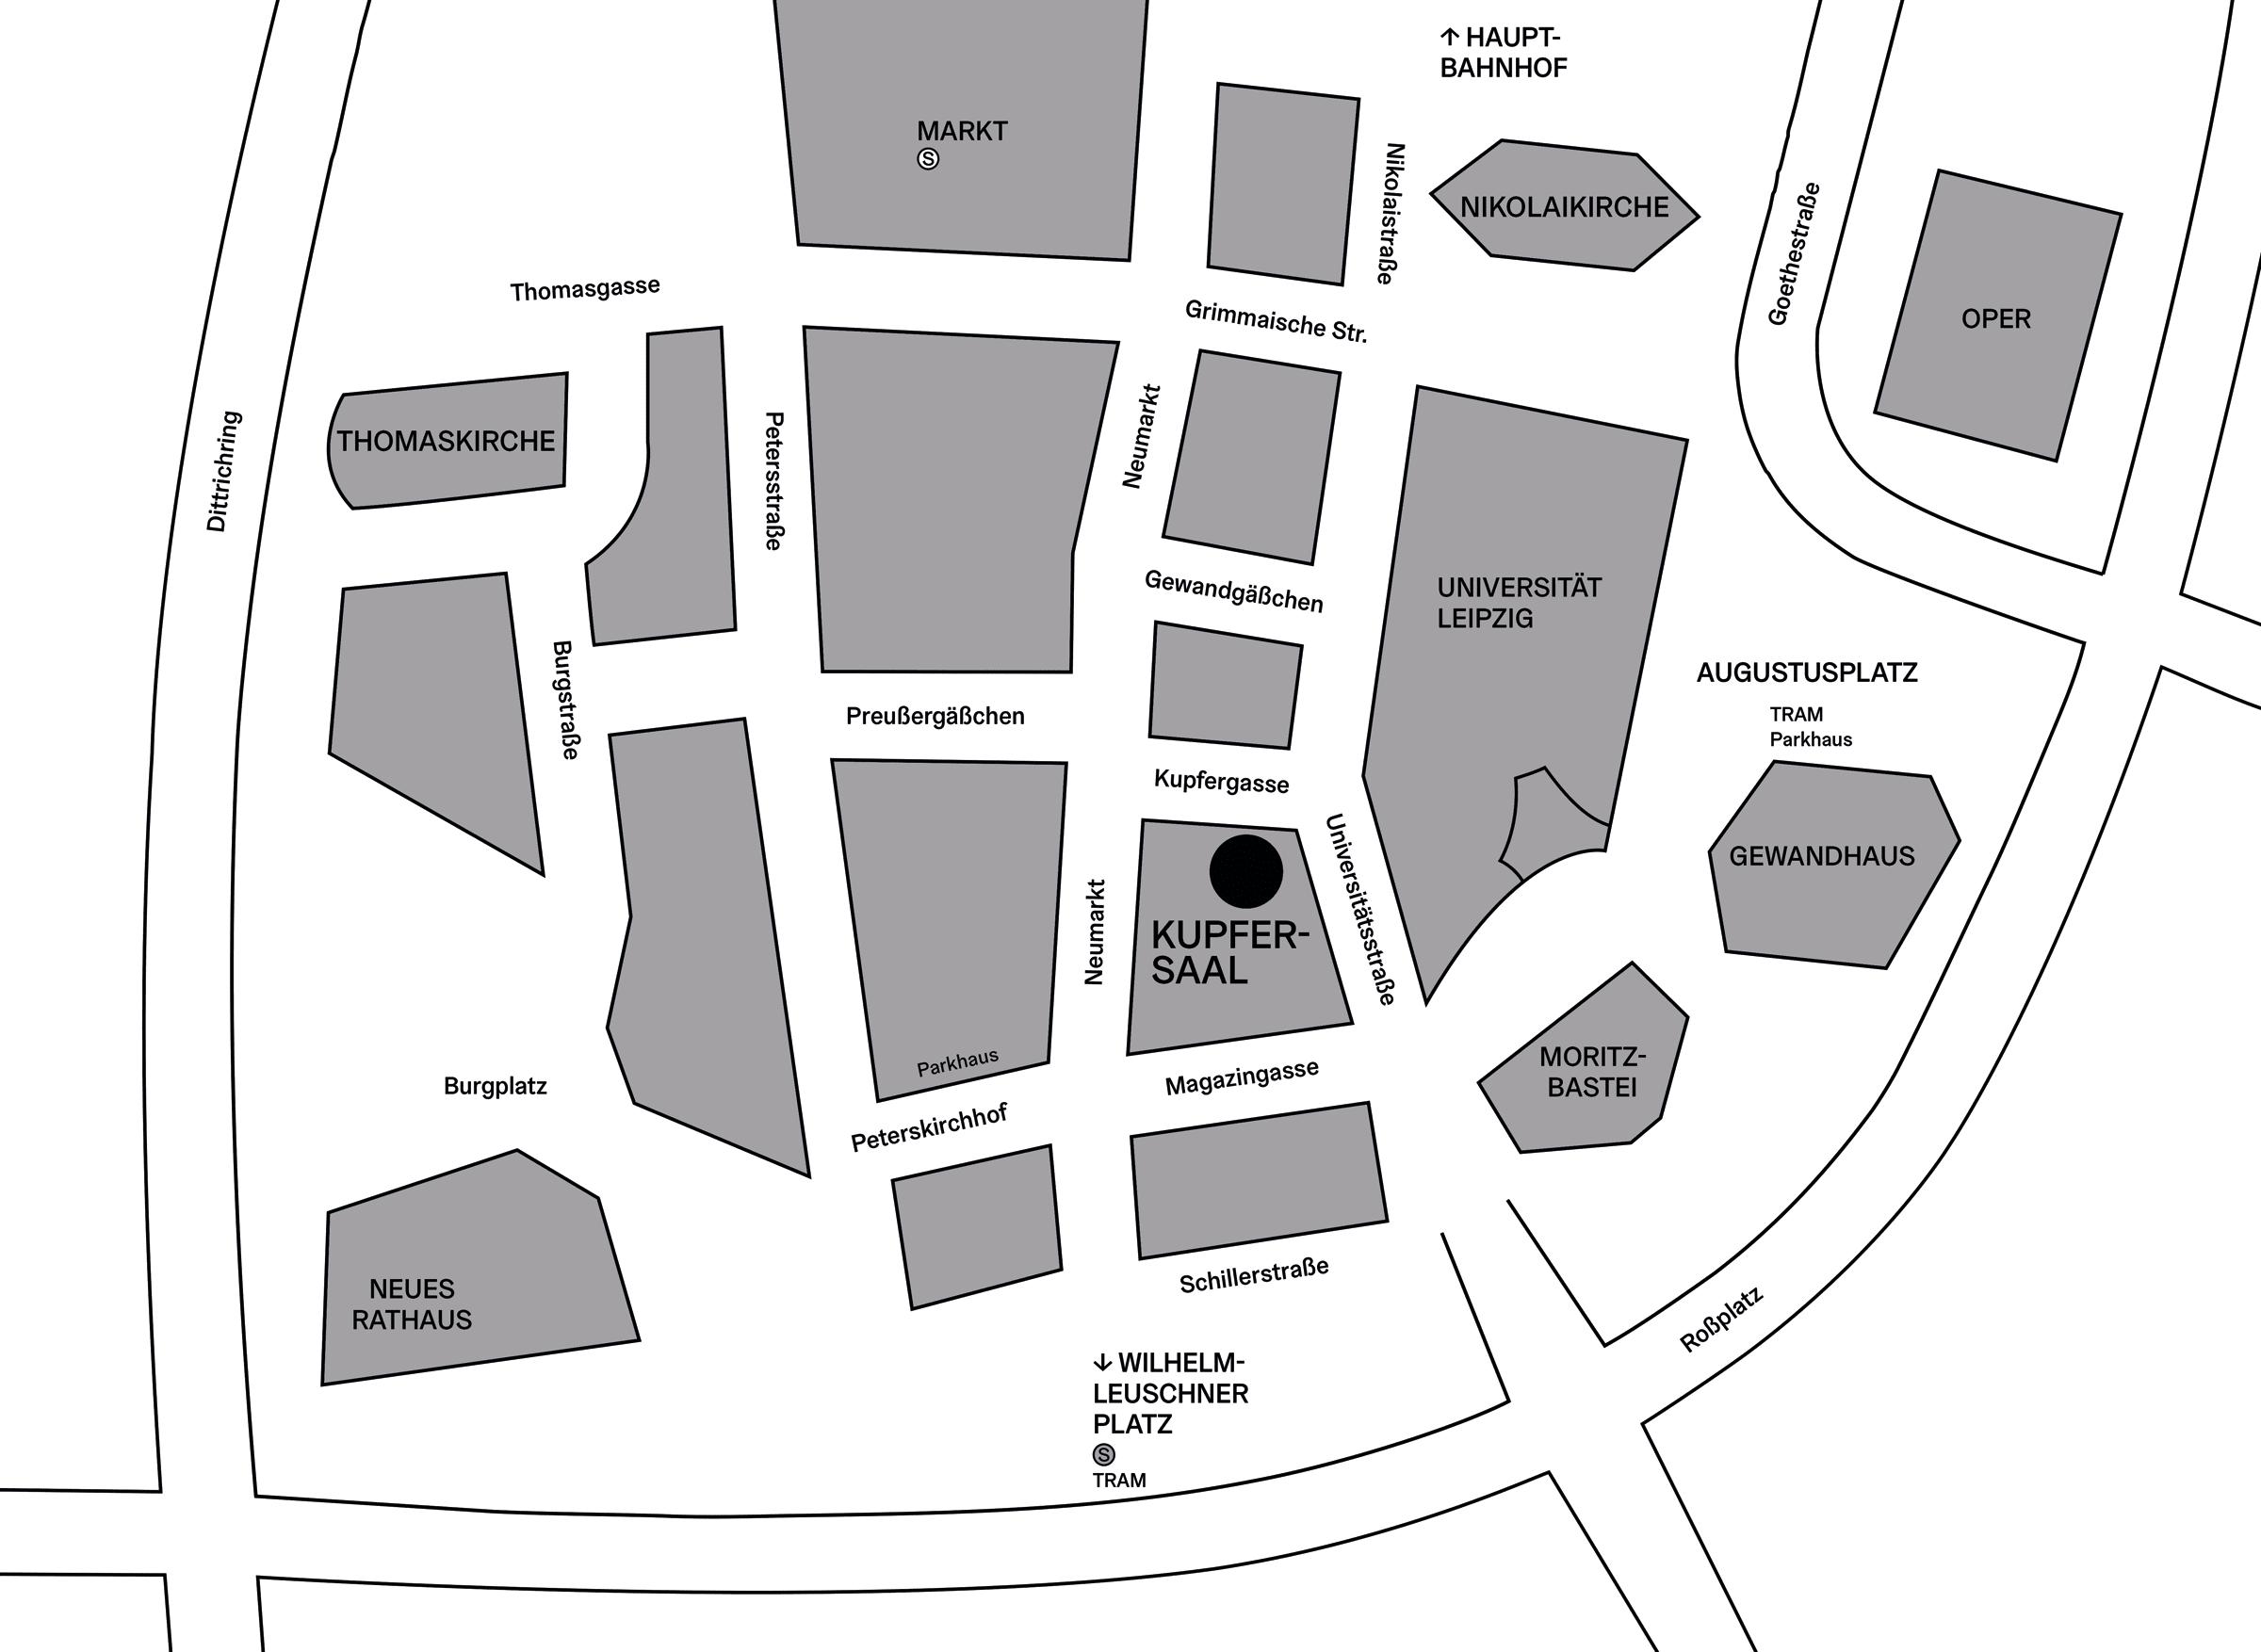 Lageplan Kupfersaal, Kupfergasse 2, 04109 Leipzig